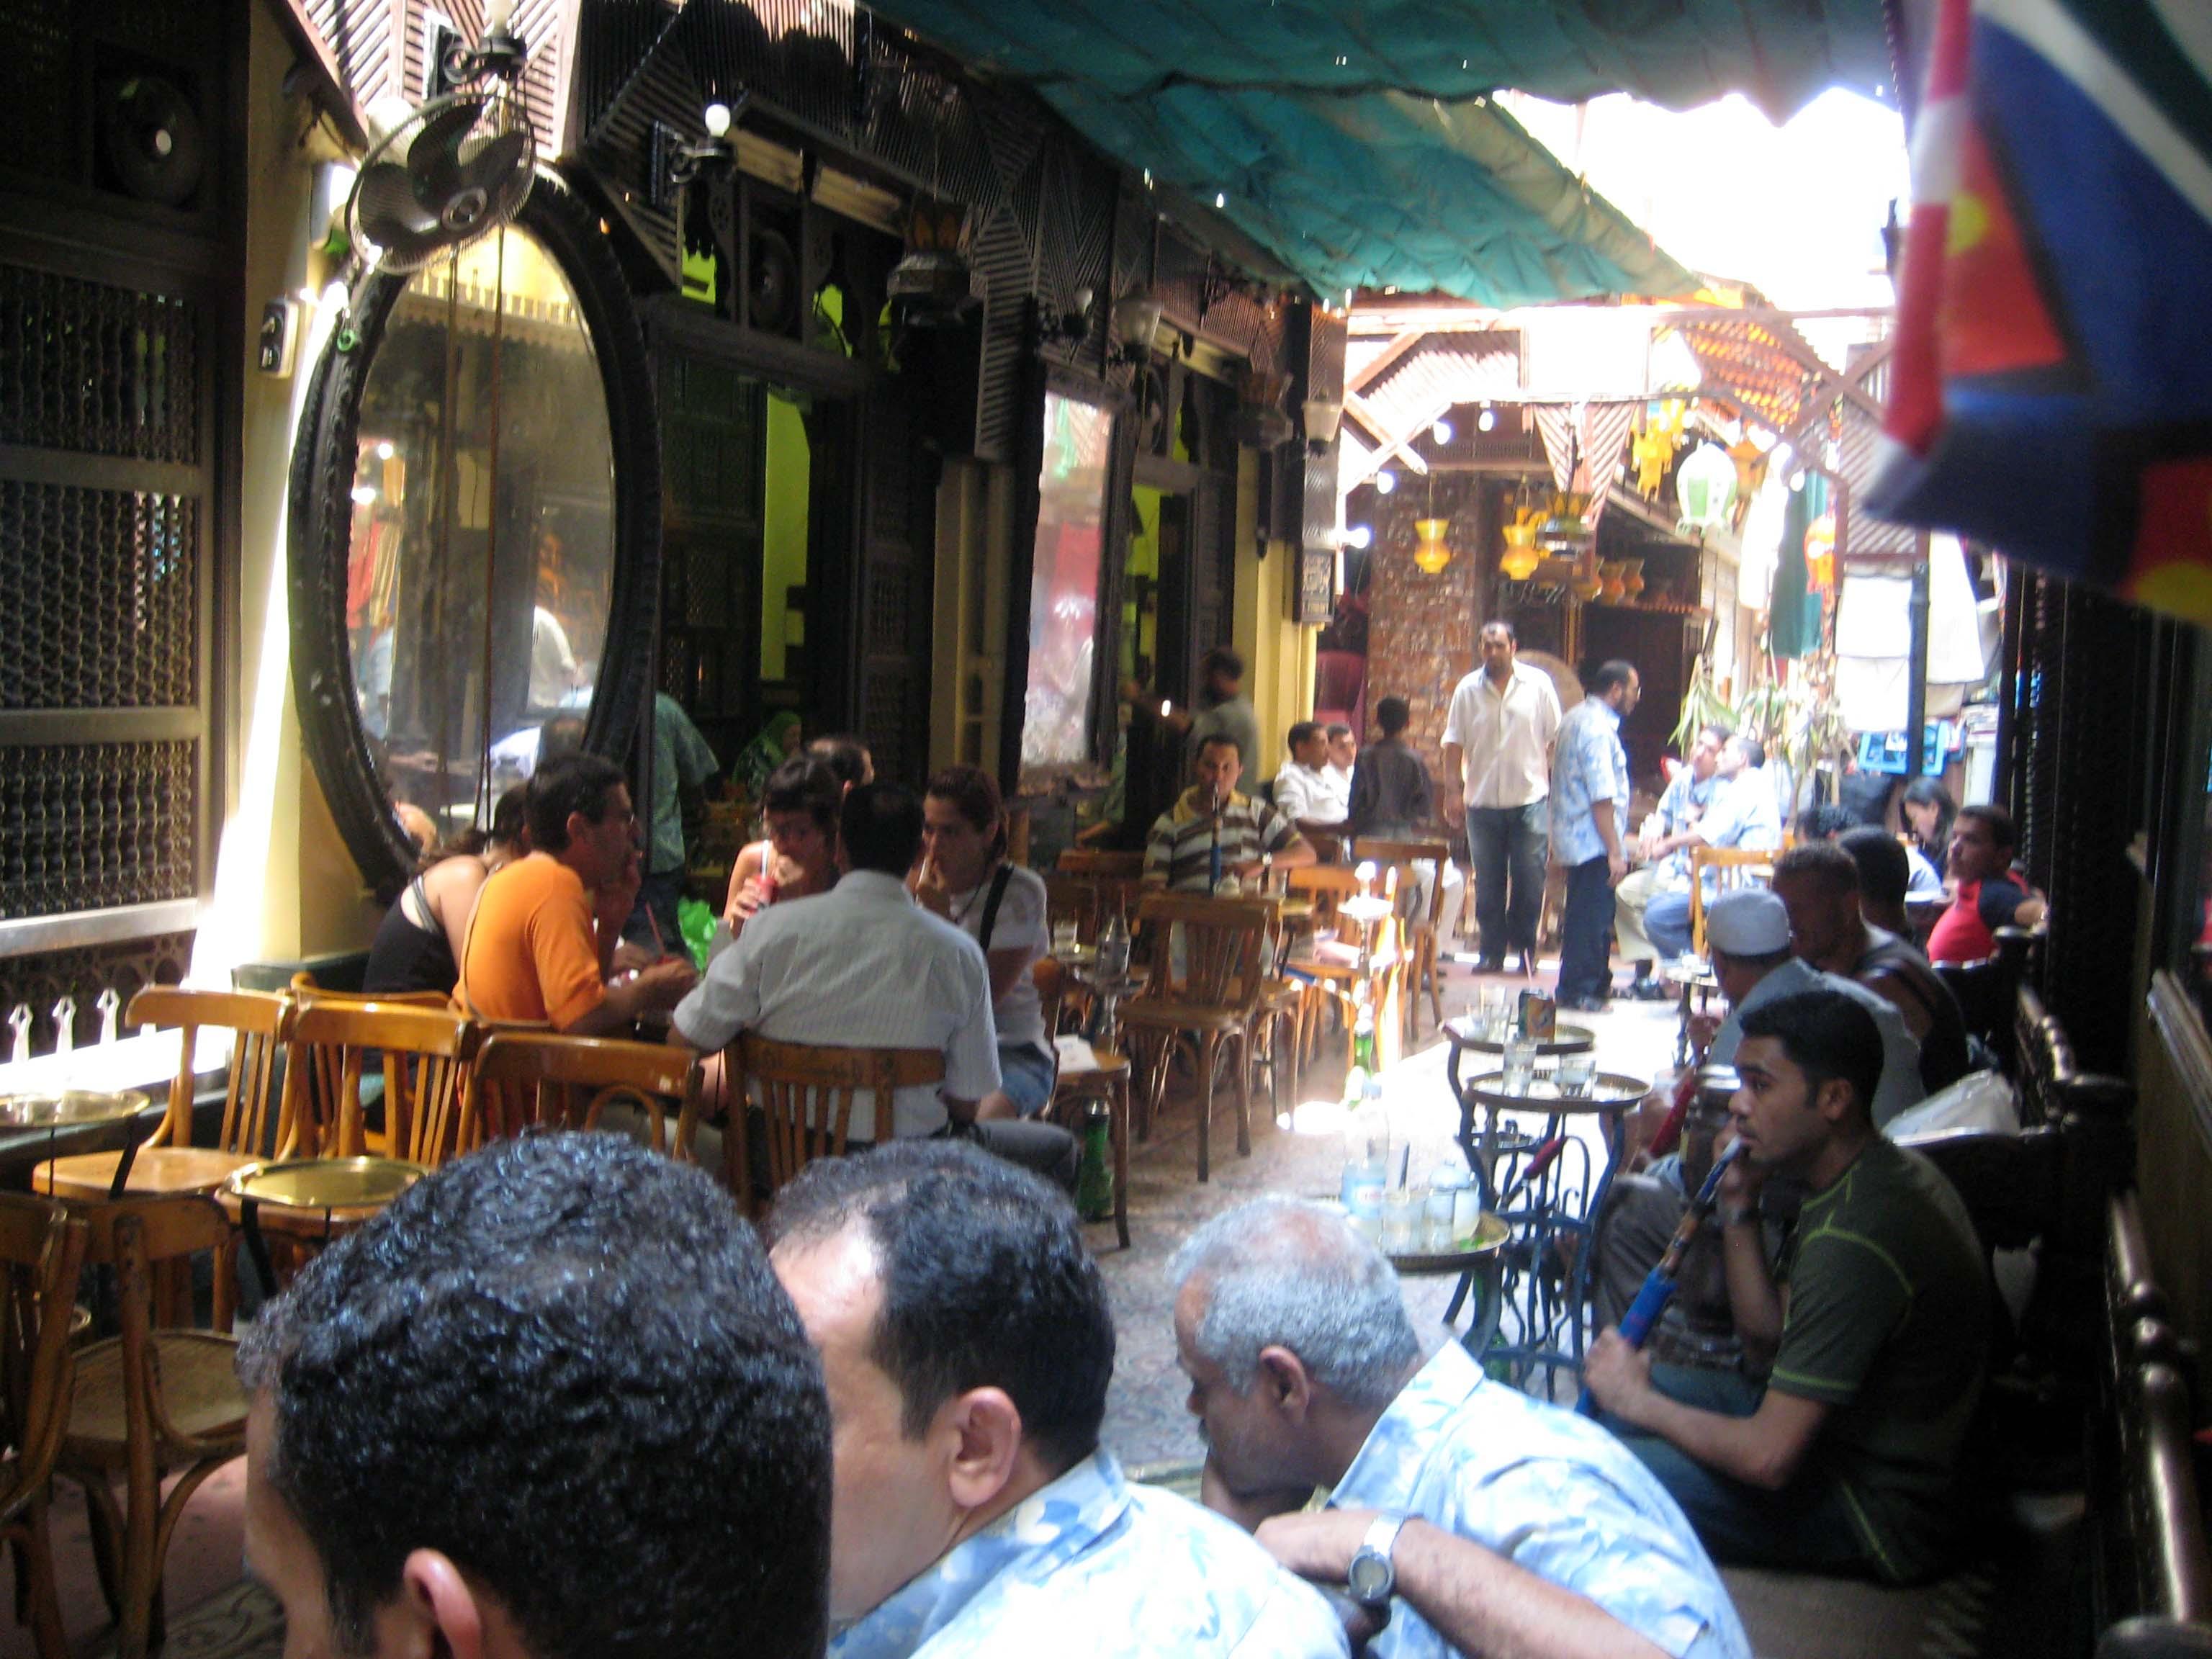 EGIPTO CAIRO El Fishawi